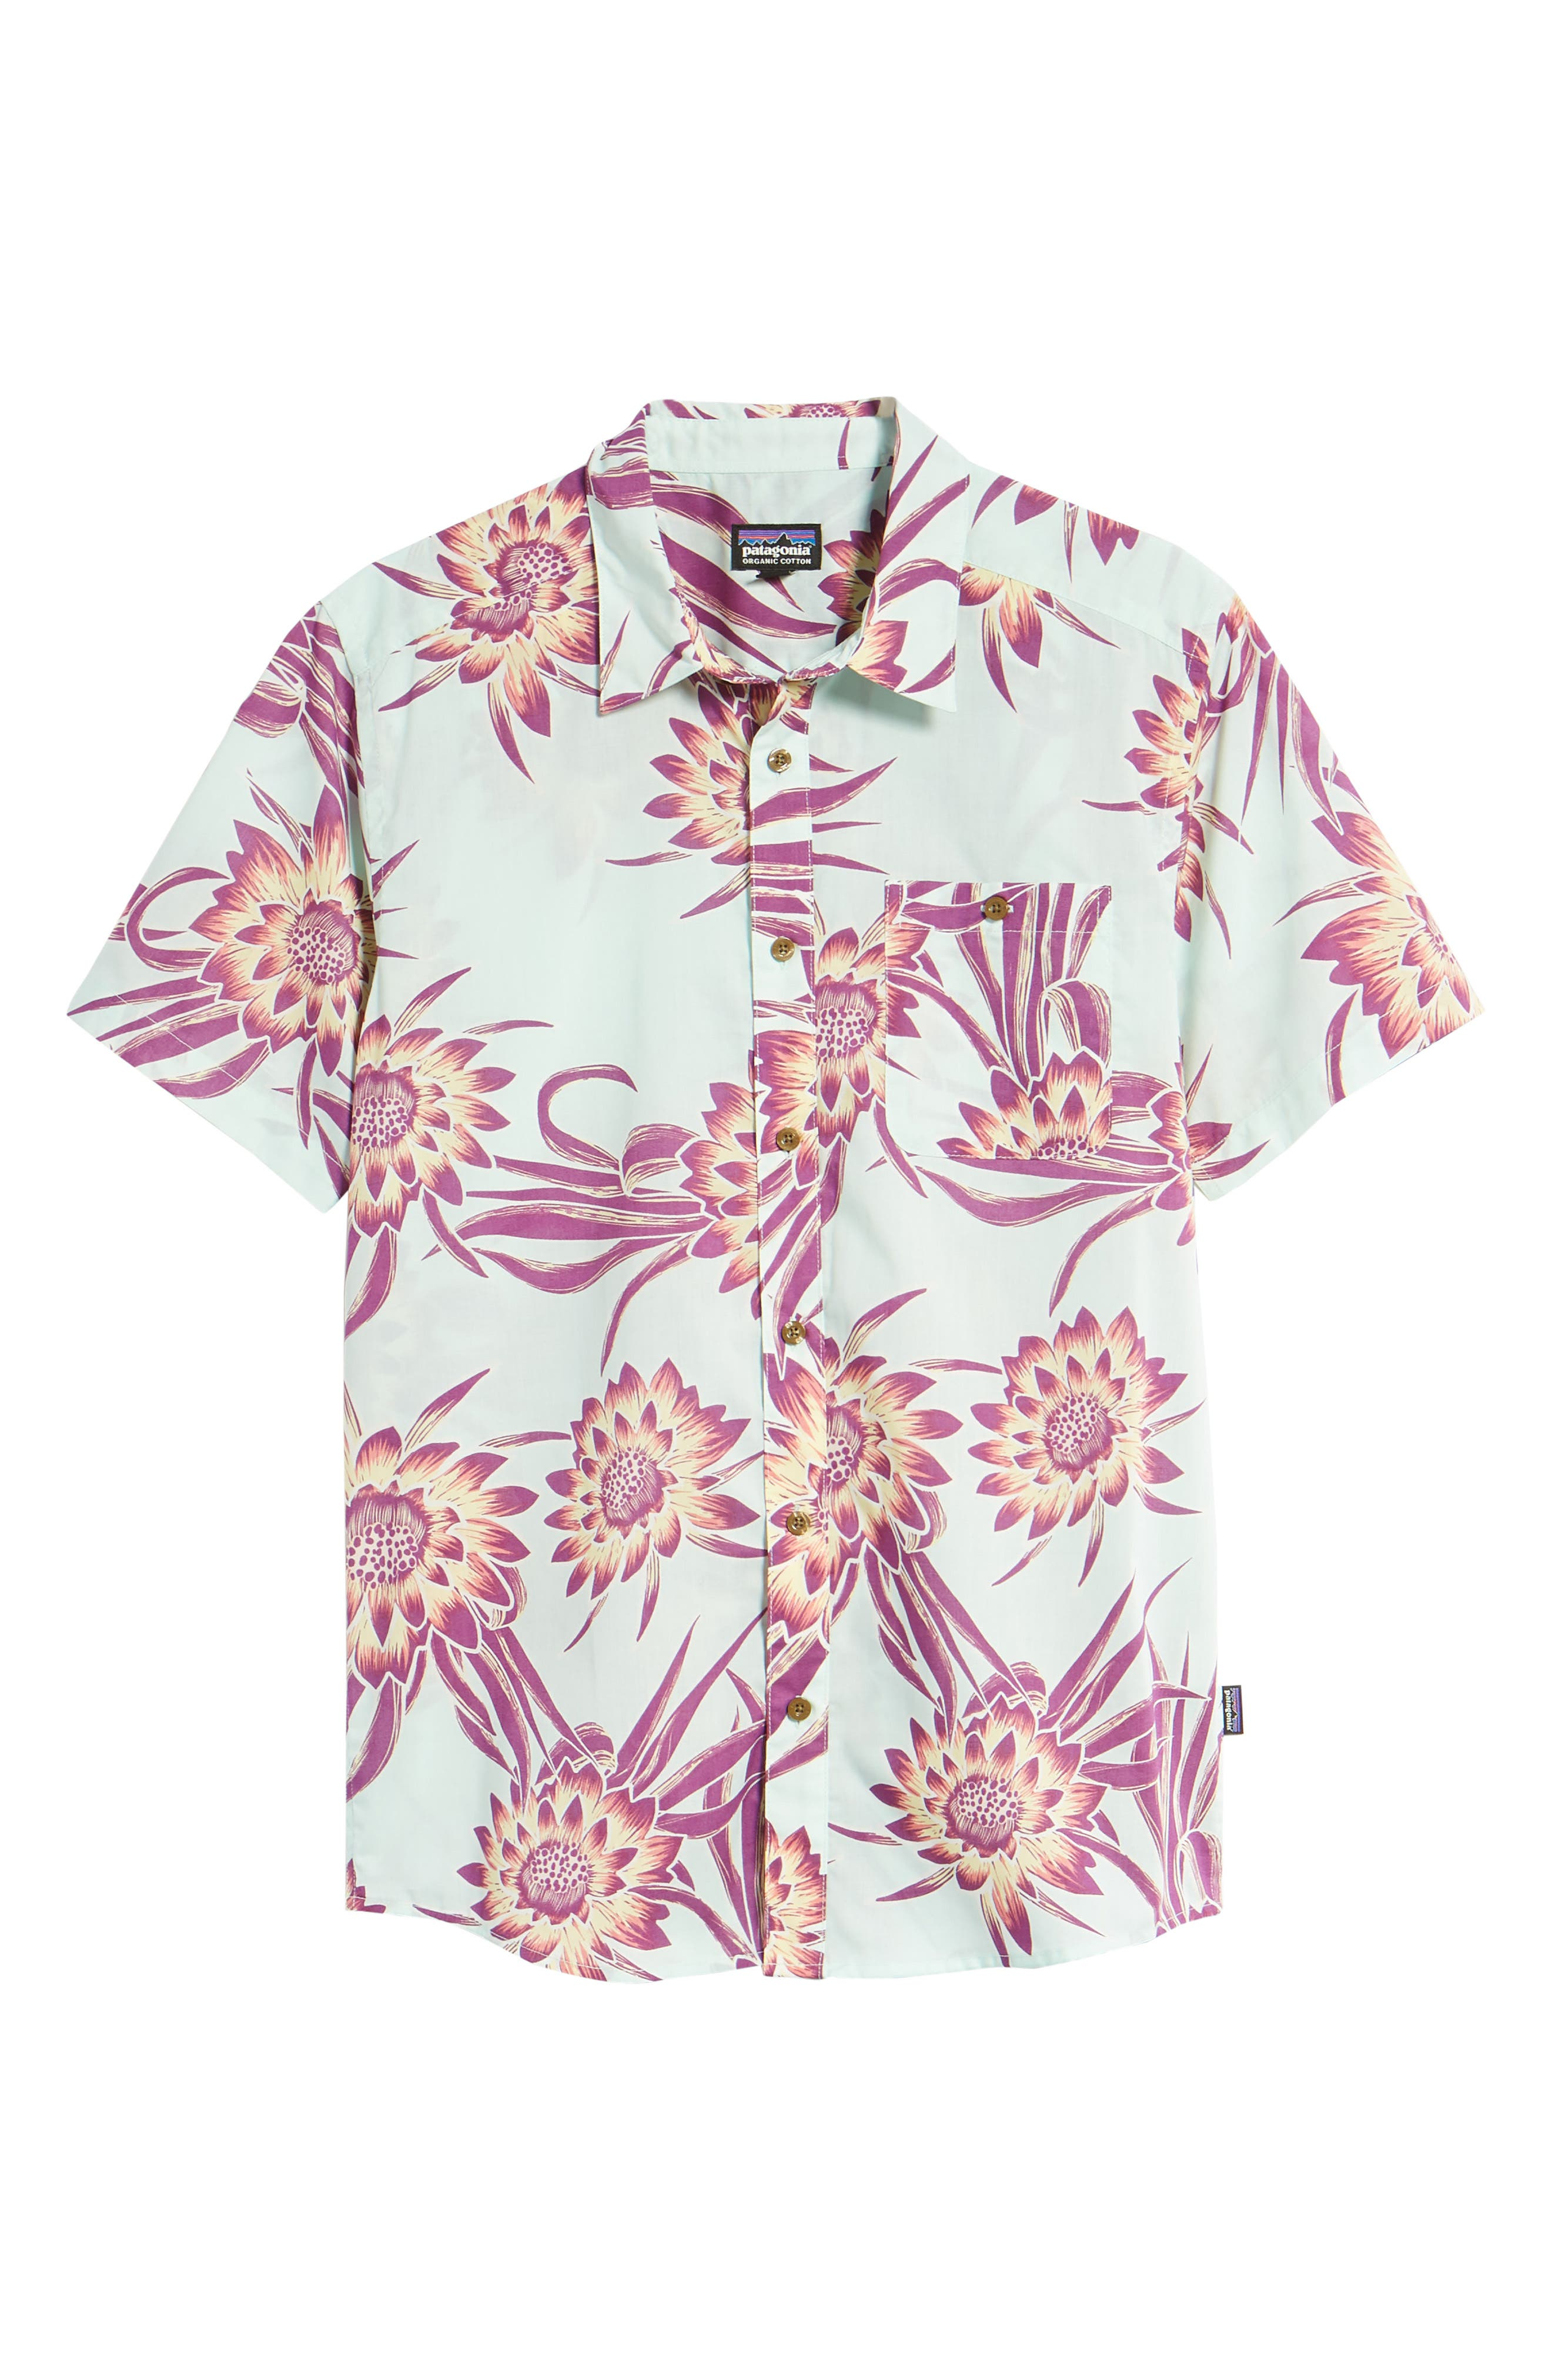 'Go To' Slim Fit Short Sleeve Sport Shirt,                             Alternate thumbnail 6, color,                             Cereus Flower/ Lite Bend Blue